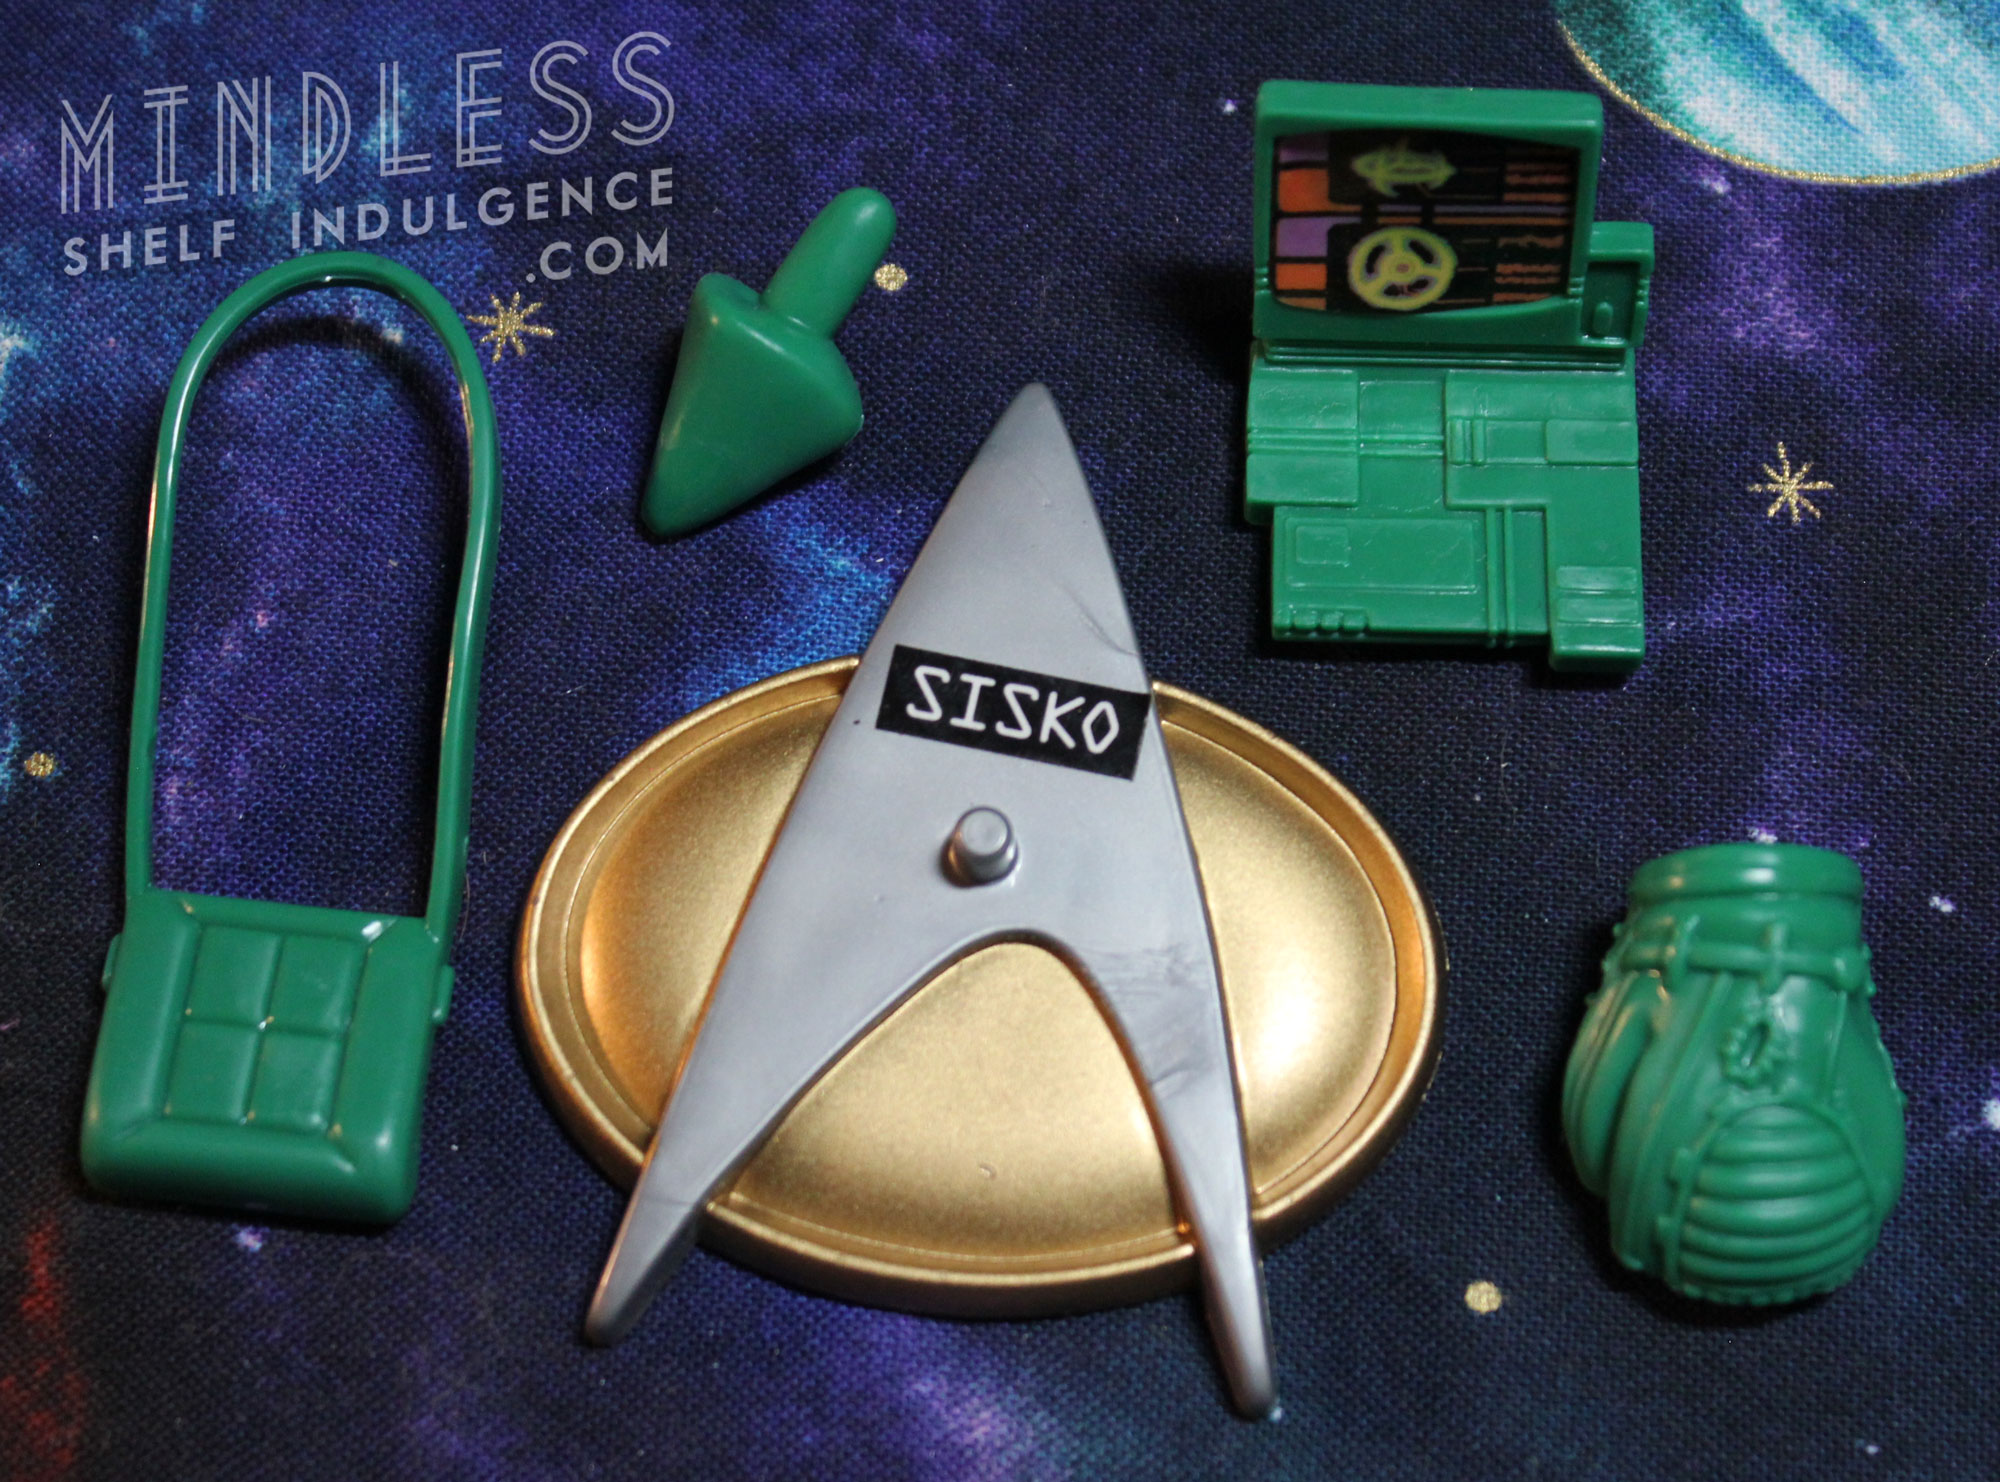 Jack Sisko's accessories